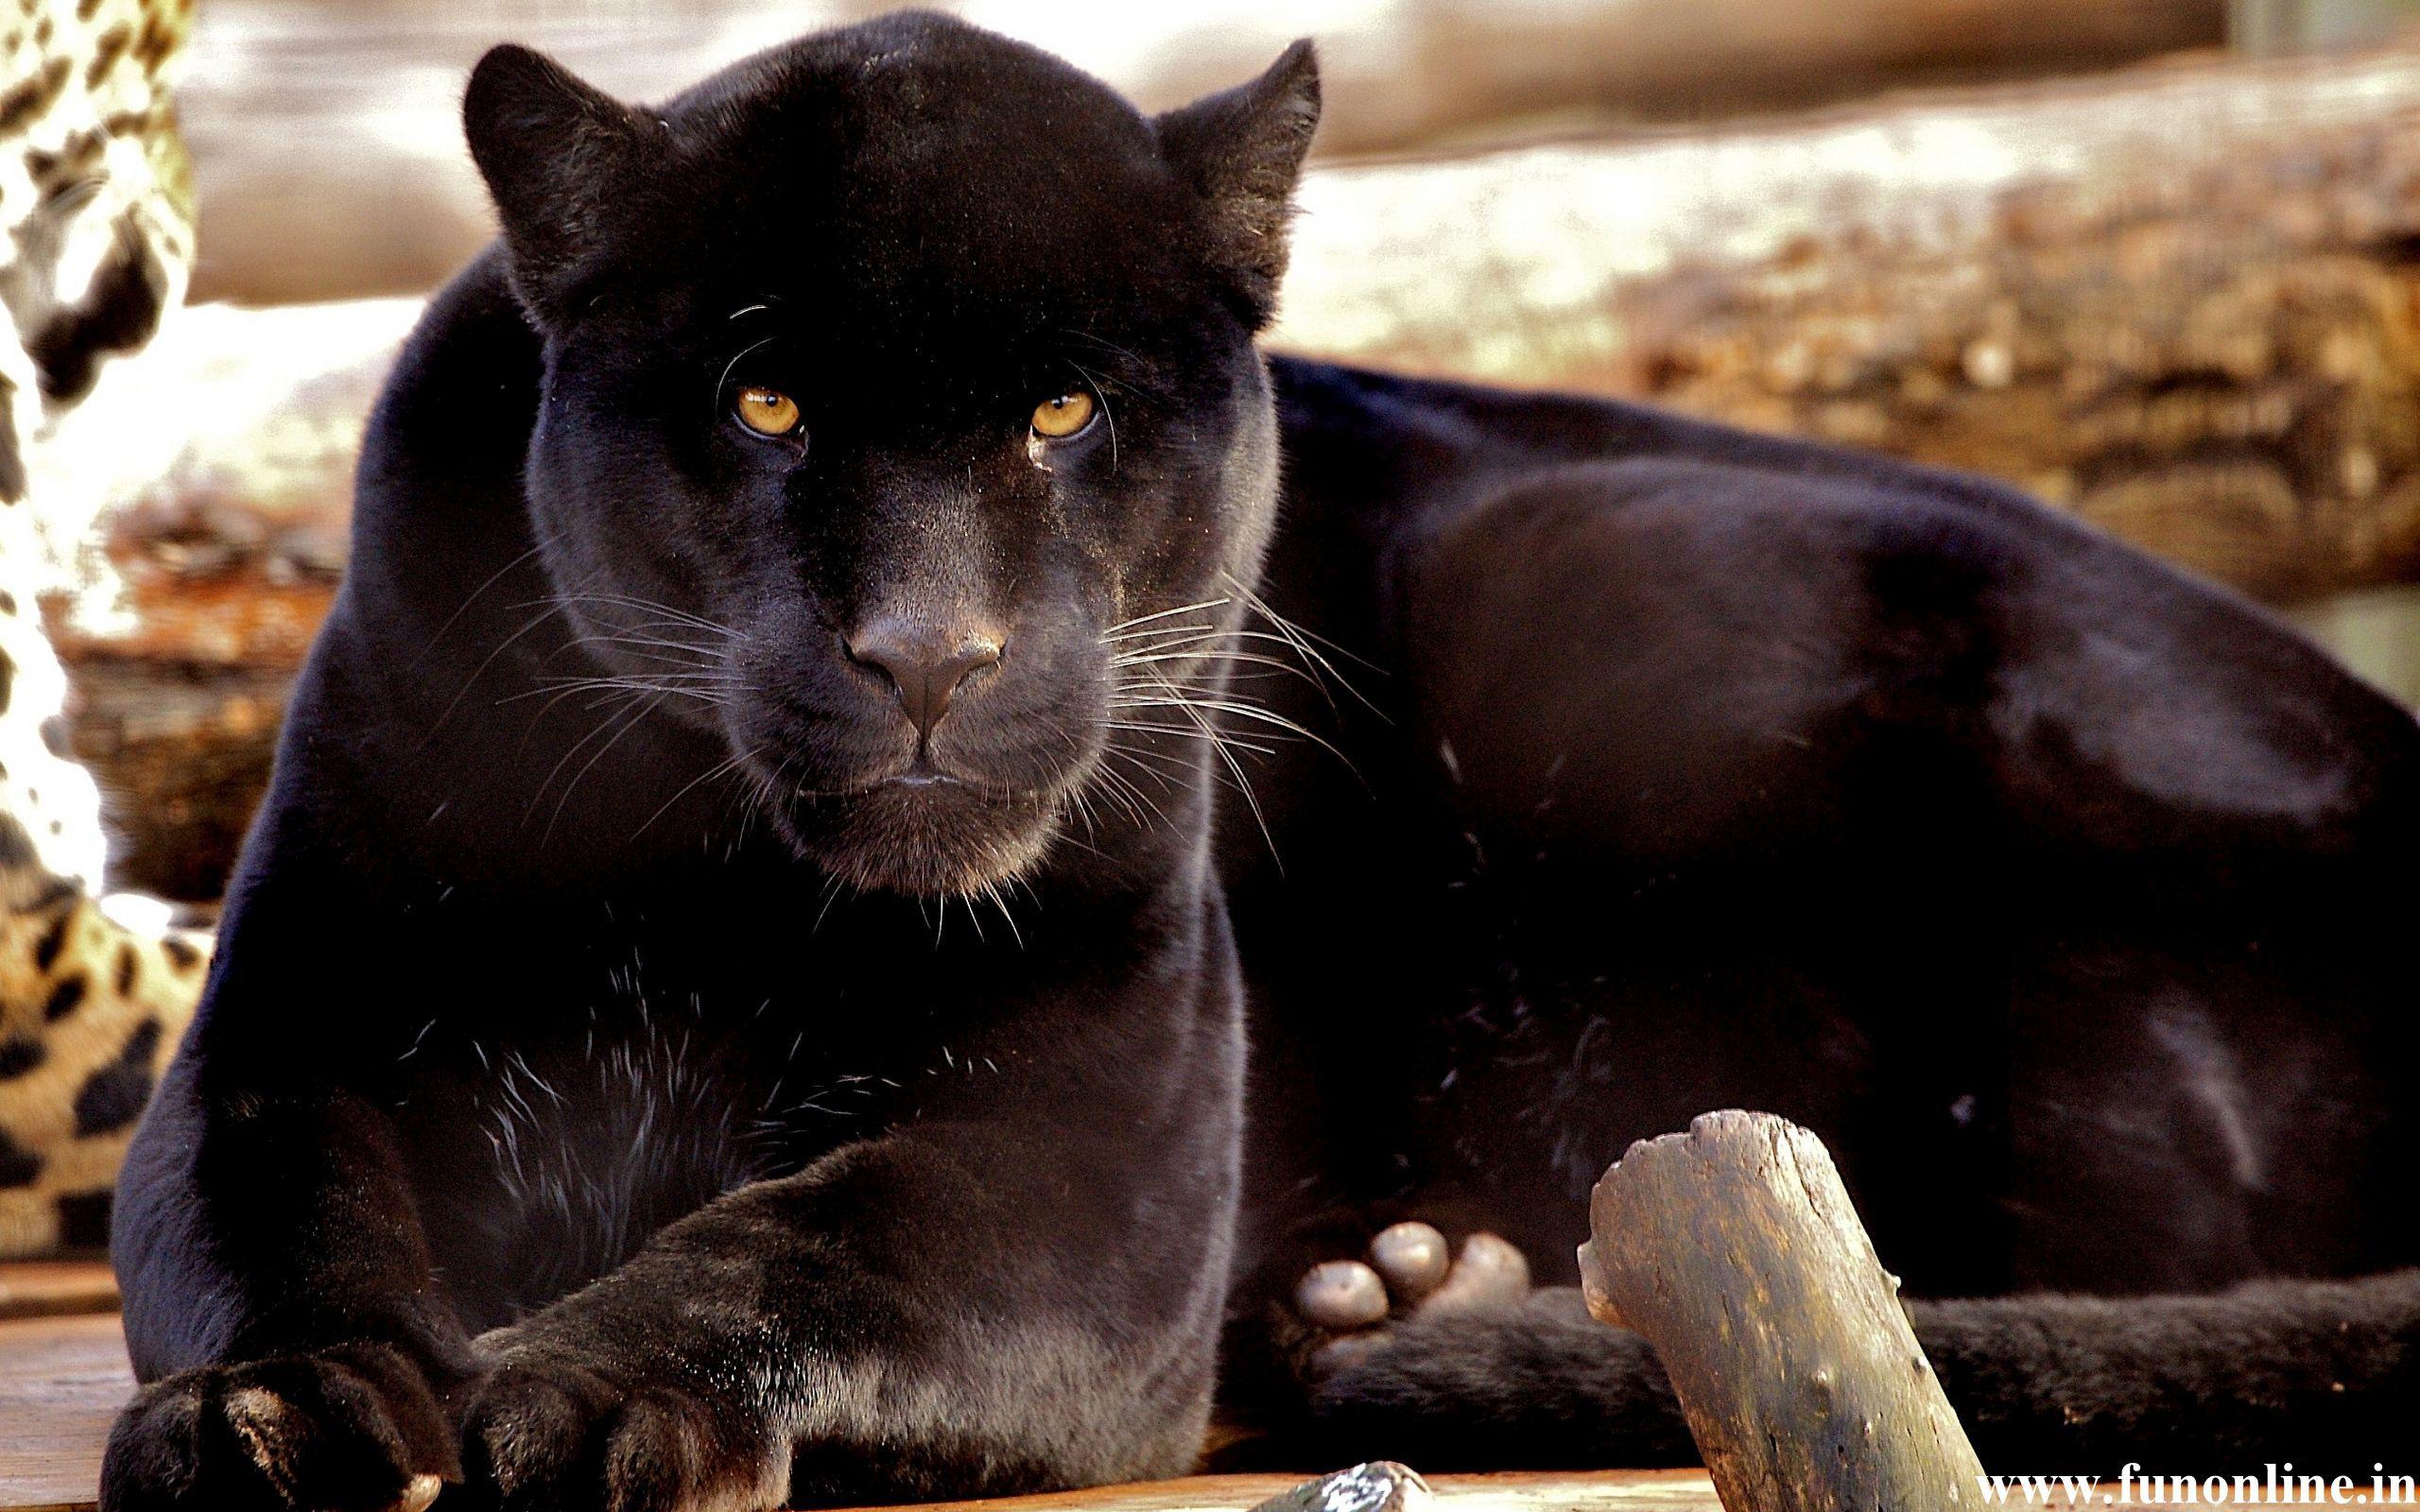 Panther Wallpapers Download Free Black Panthers Hd Wallpaper Animals Panther Jaguar Leopard